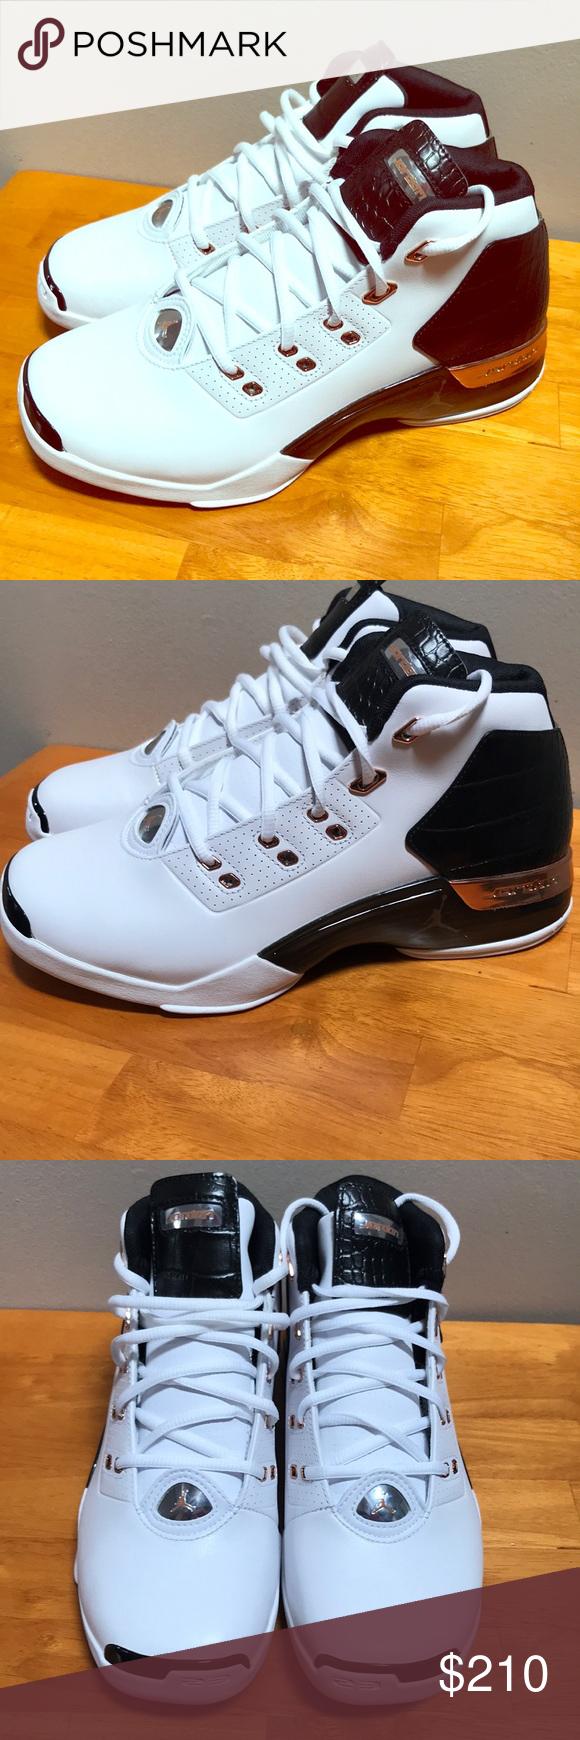 873fde5ebb7 New Nike Air Jordan 17 XVII Retro Copper Size 8.5 Brand new & 100% Nike